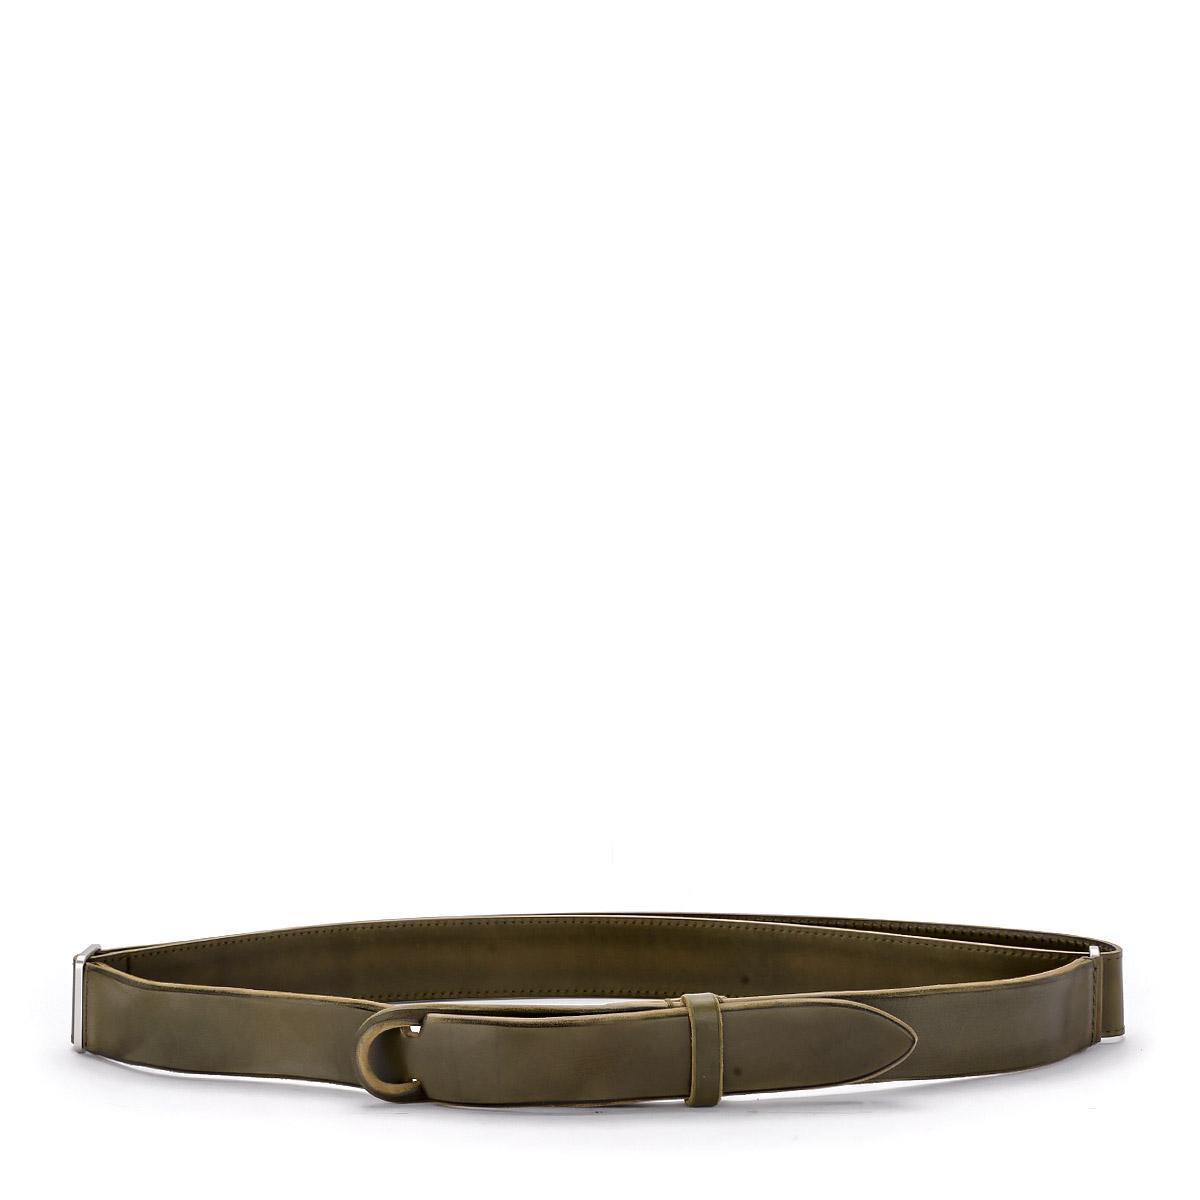 Cintura Orciani No Buckle in pelle lavata verde